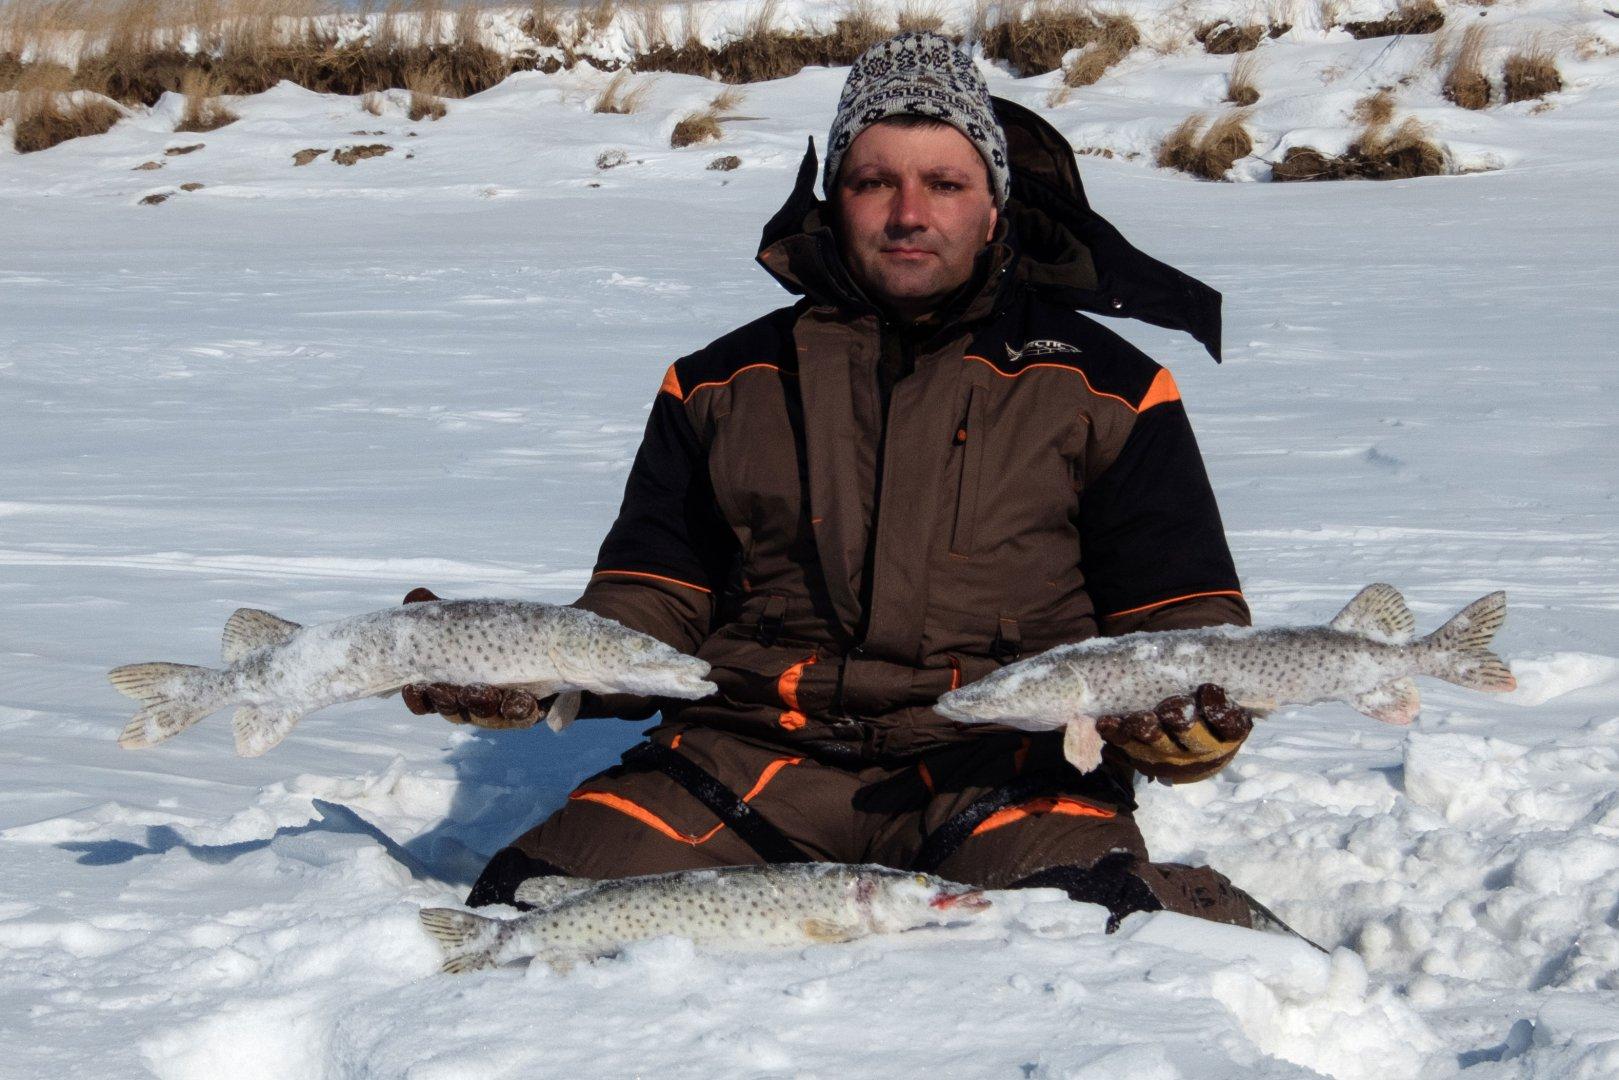 рыбалка в комсомольске-на-амуре фото